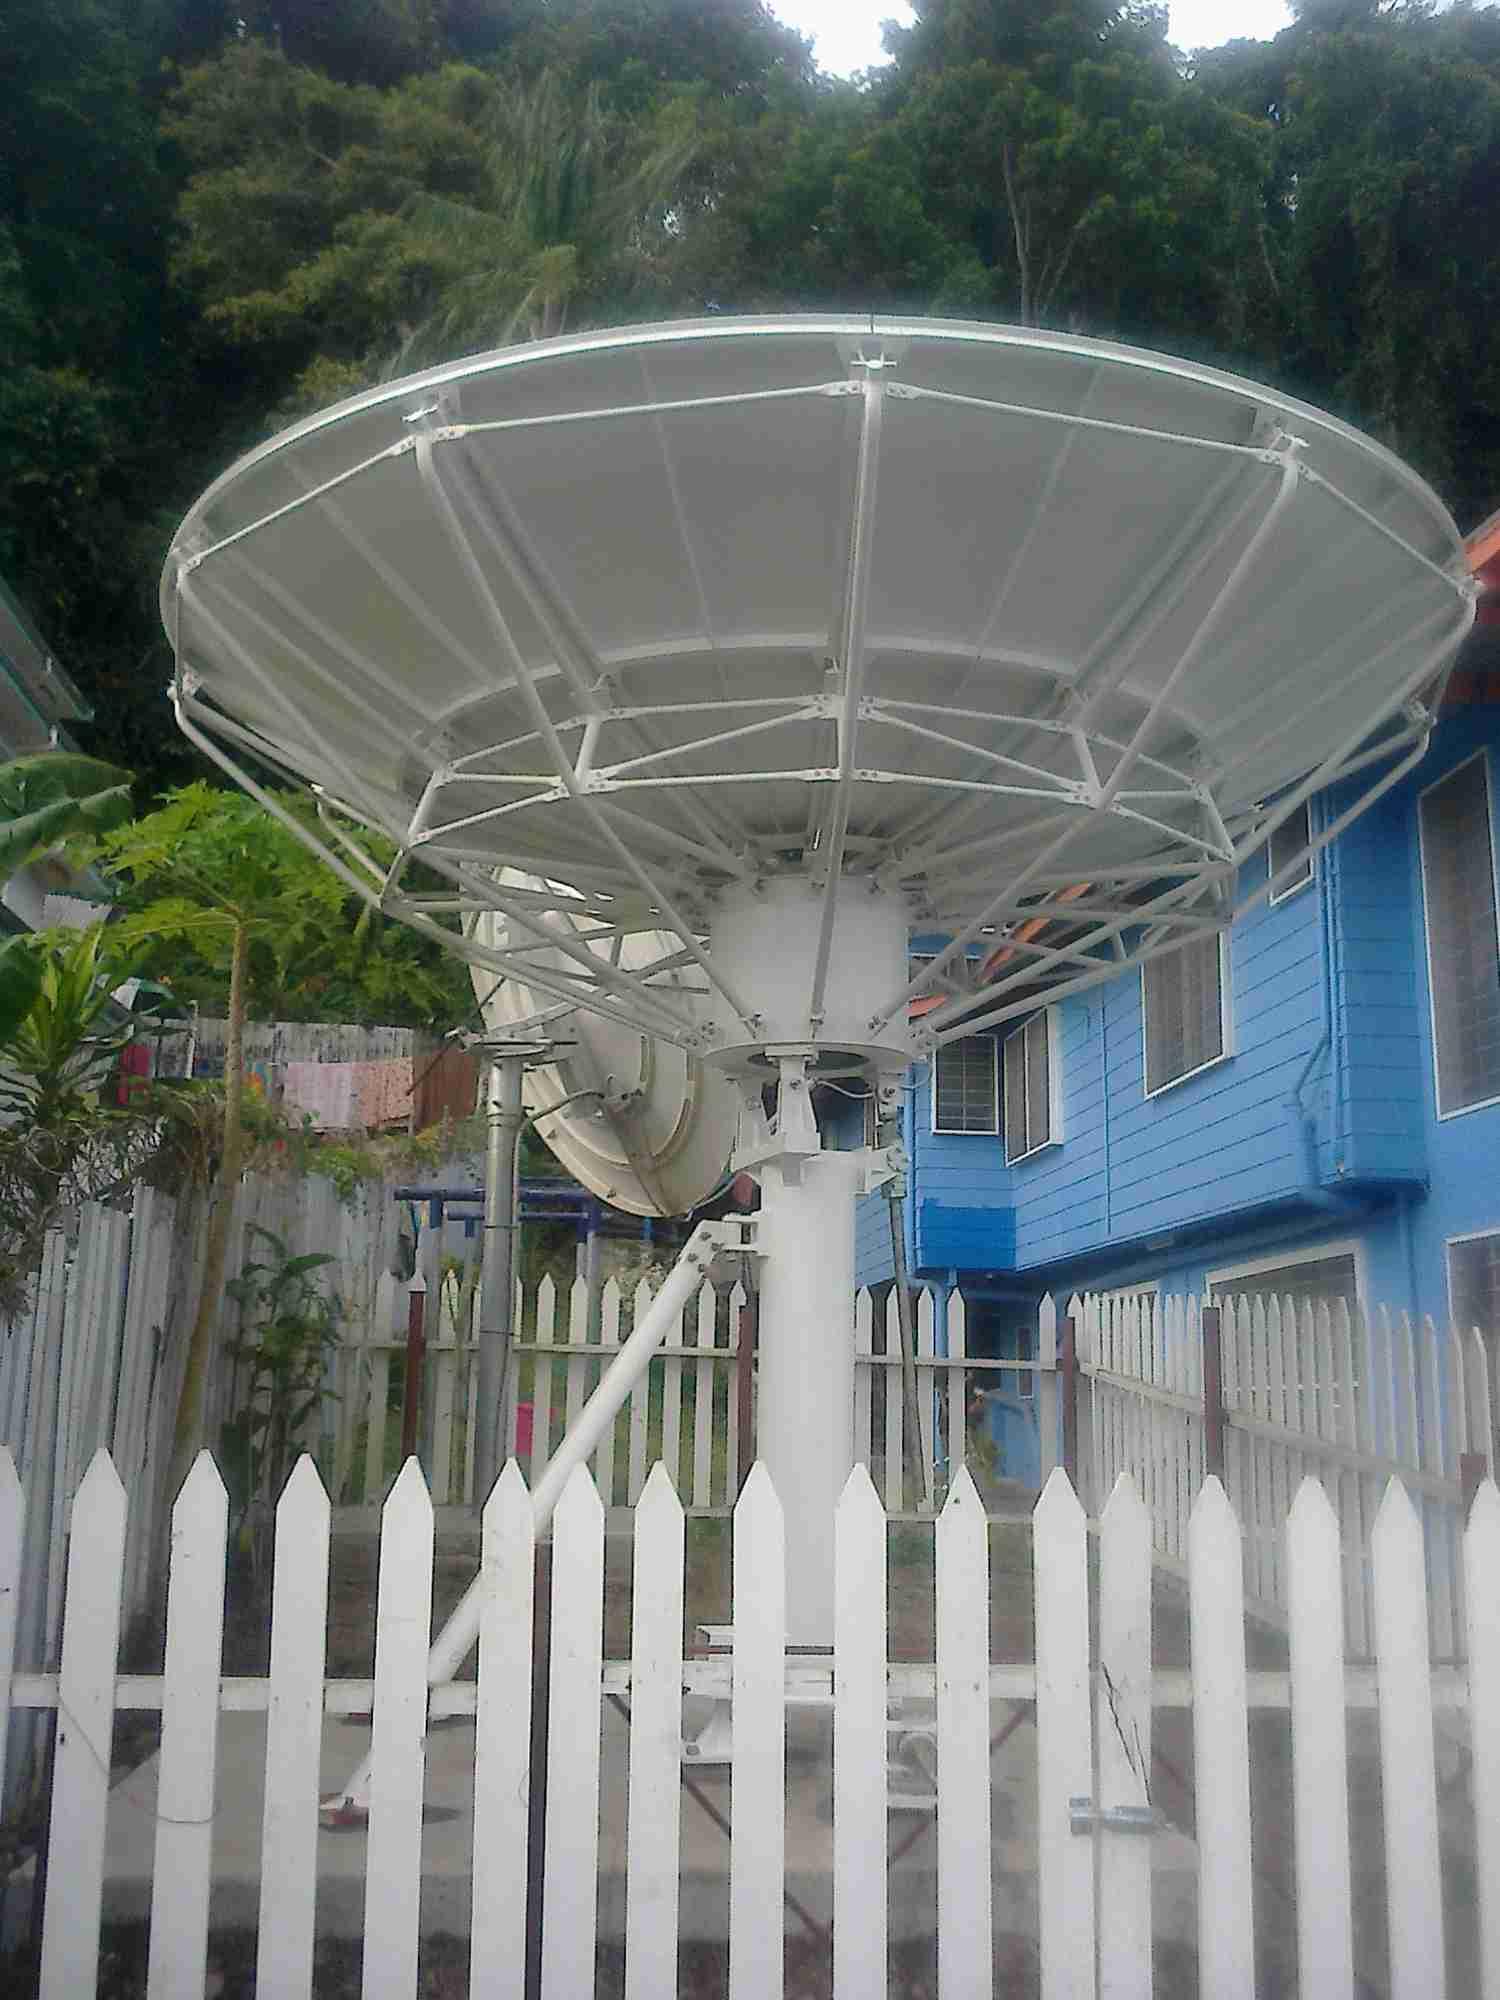 4.5M VSAT antenna